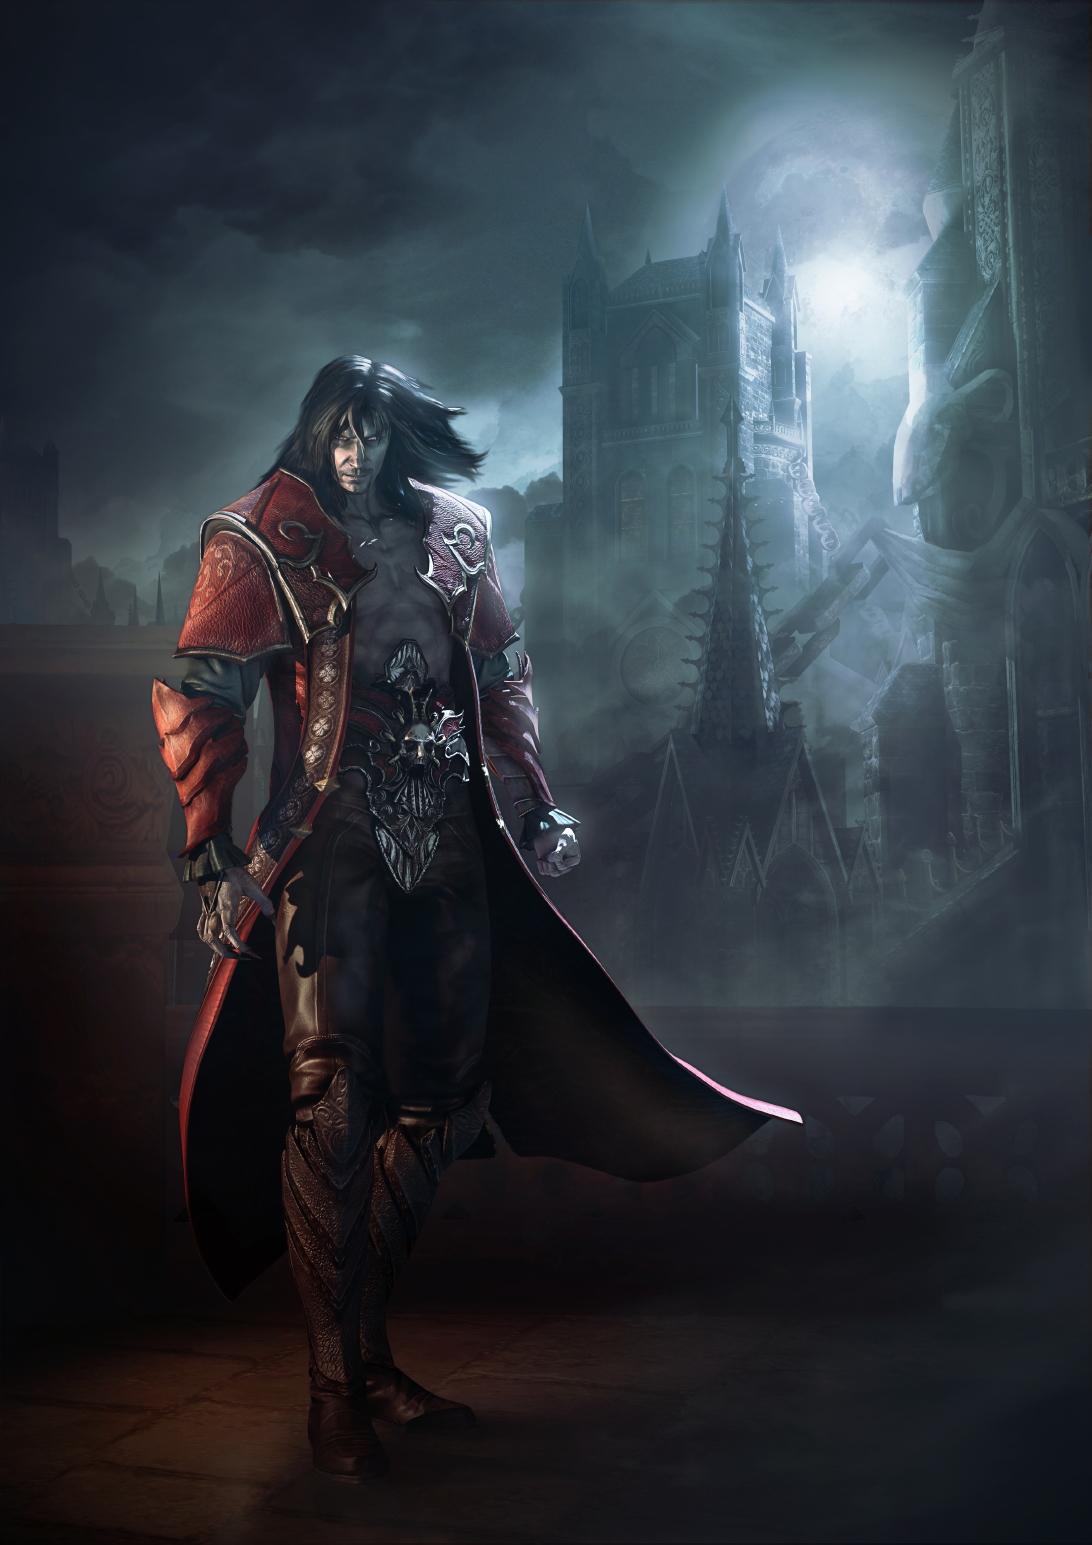 Sběratelská edice Castlevania: Lords of Shadow 2 89433